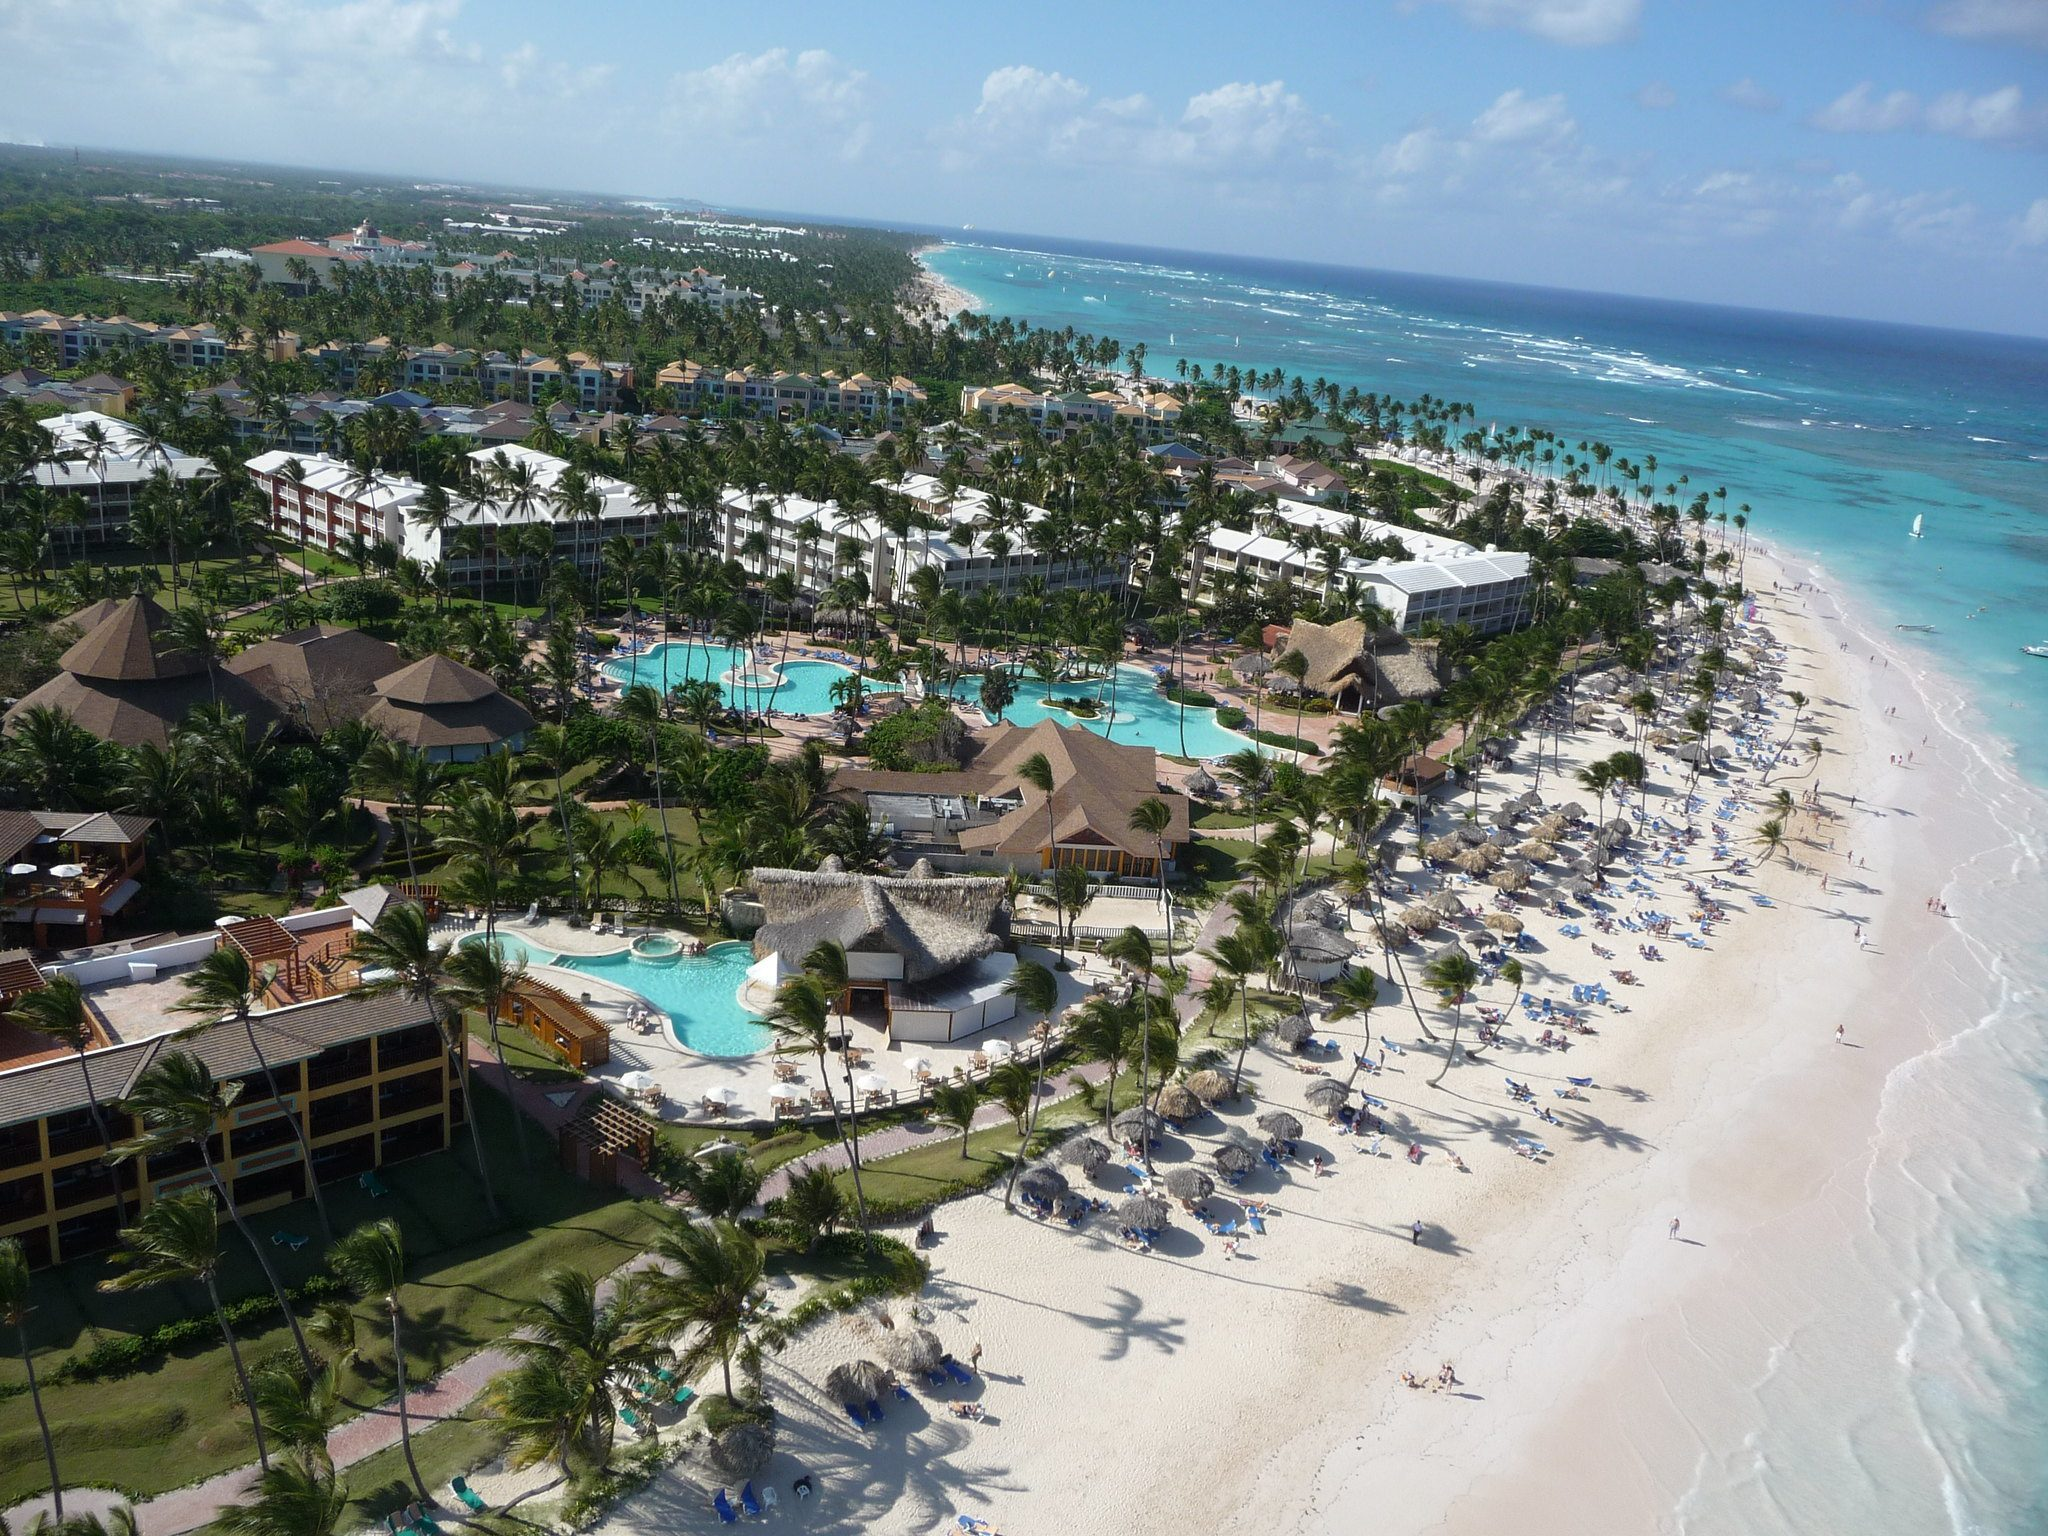 The Best Beaches in Punta Cana, Dominican Republic